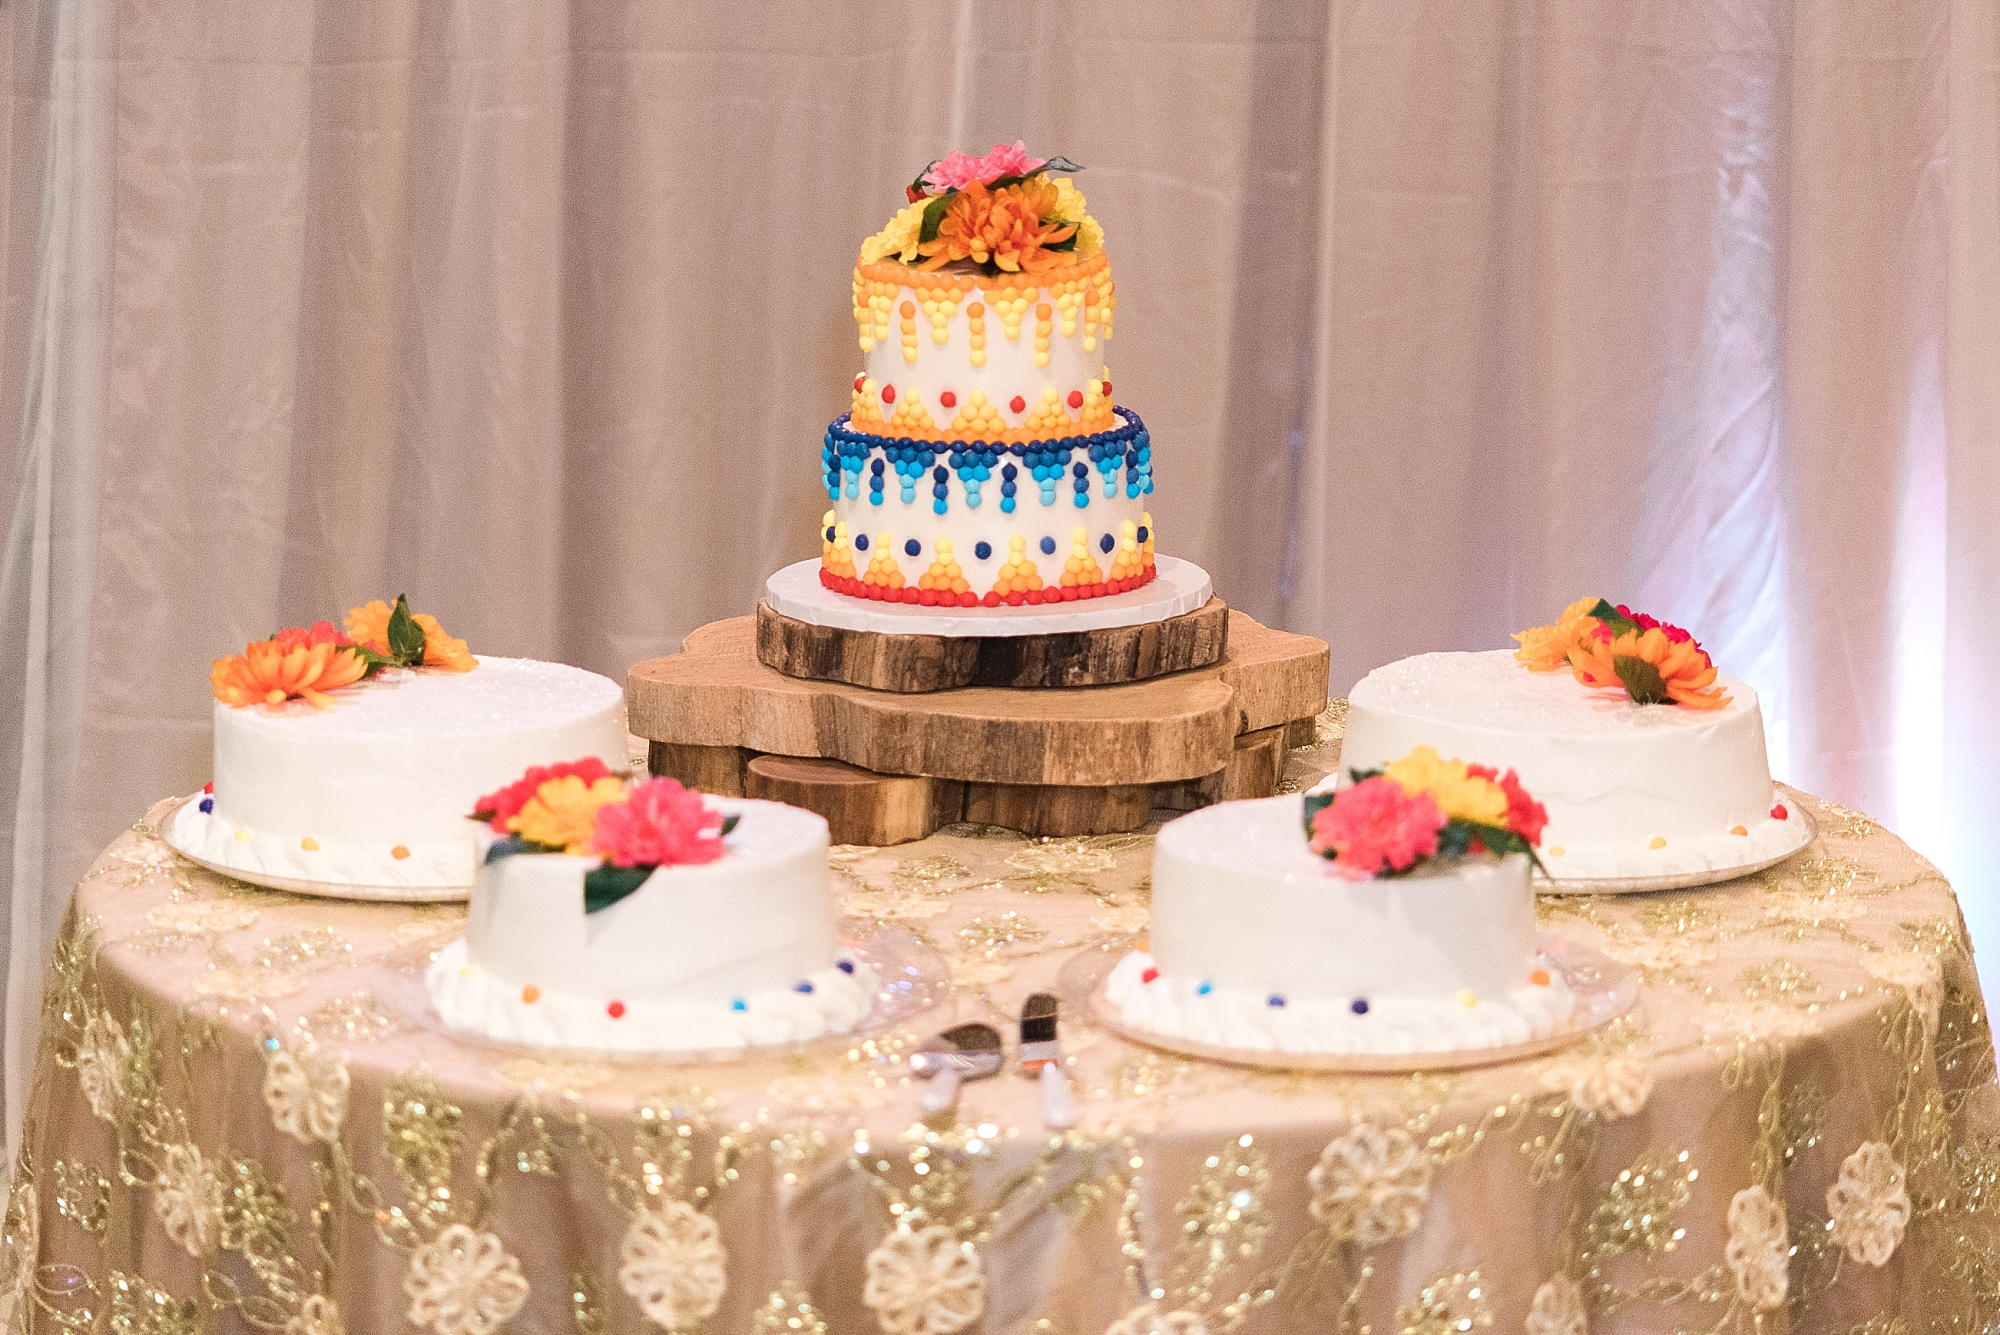 Tres leches wedding cake? Yum!